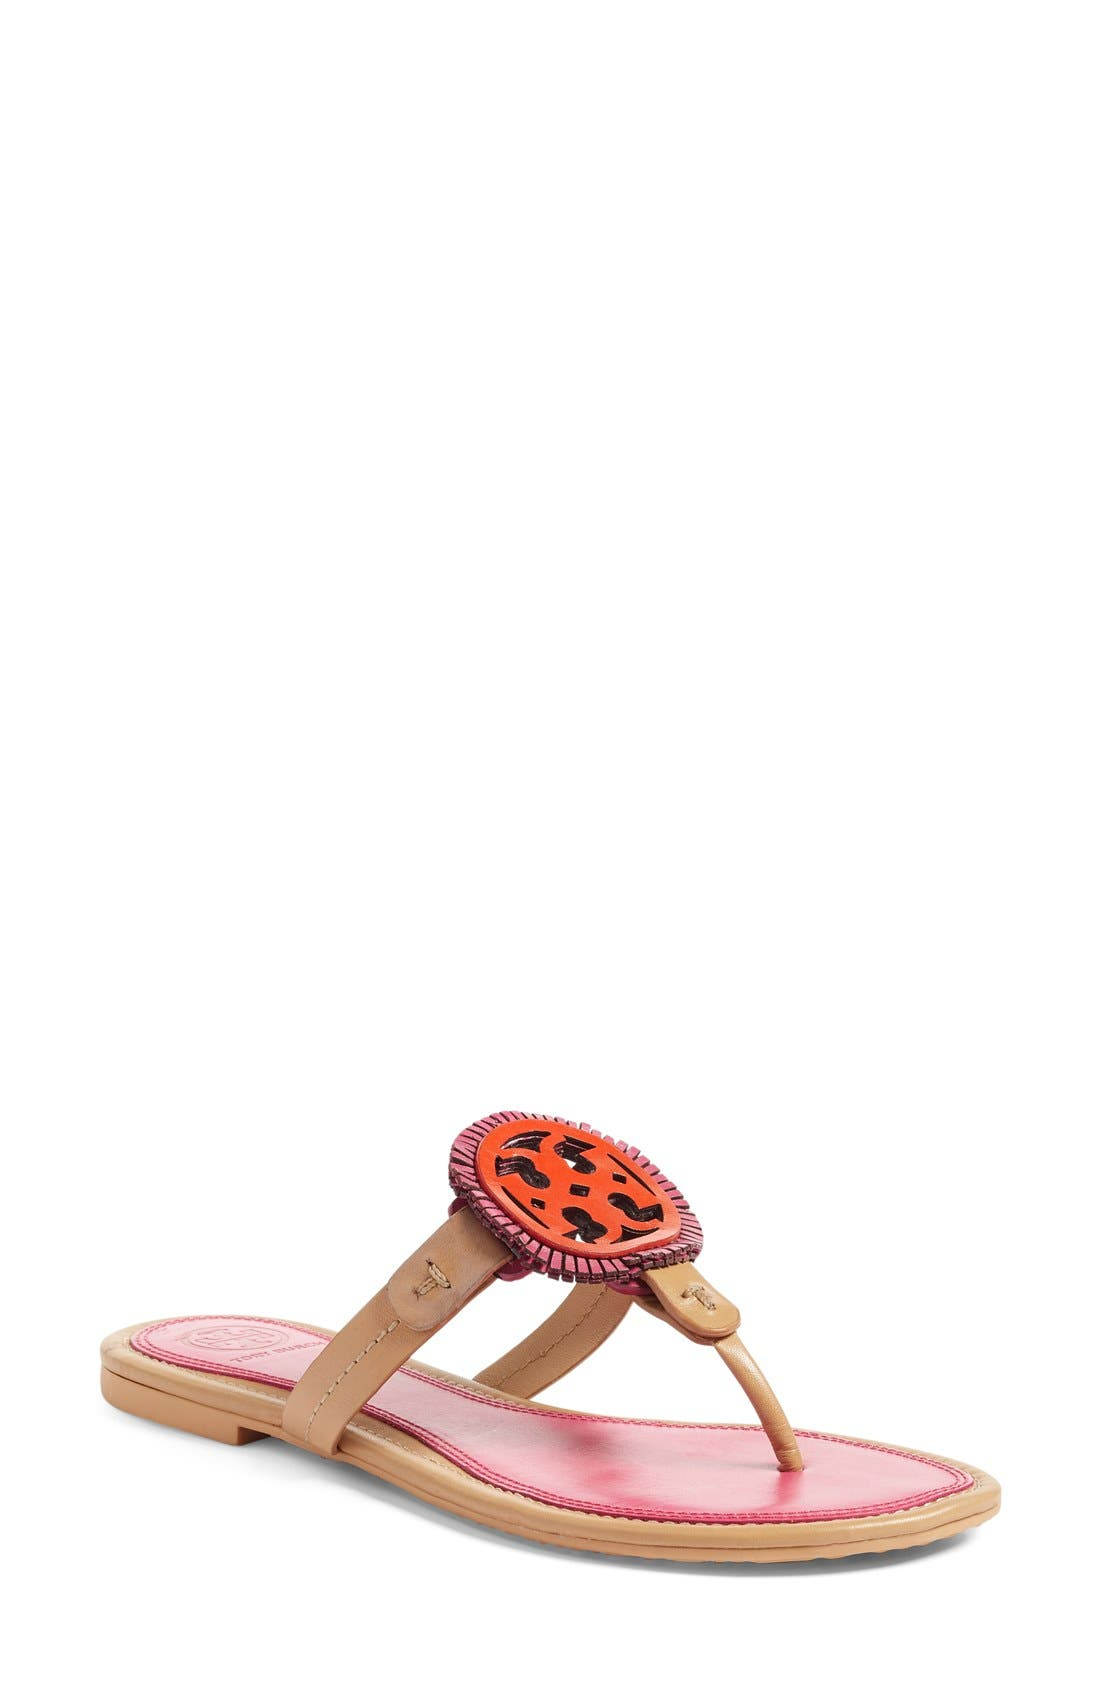 Alternate Image 1 Selected - Tory Burch Miller Sandal (Women)